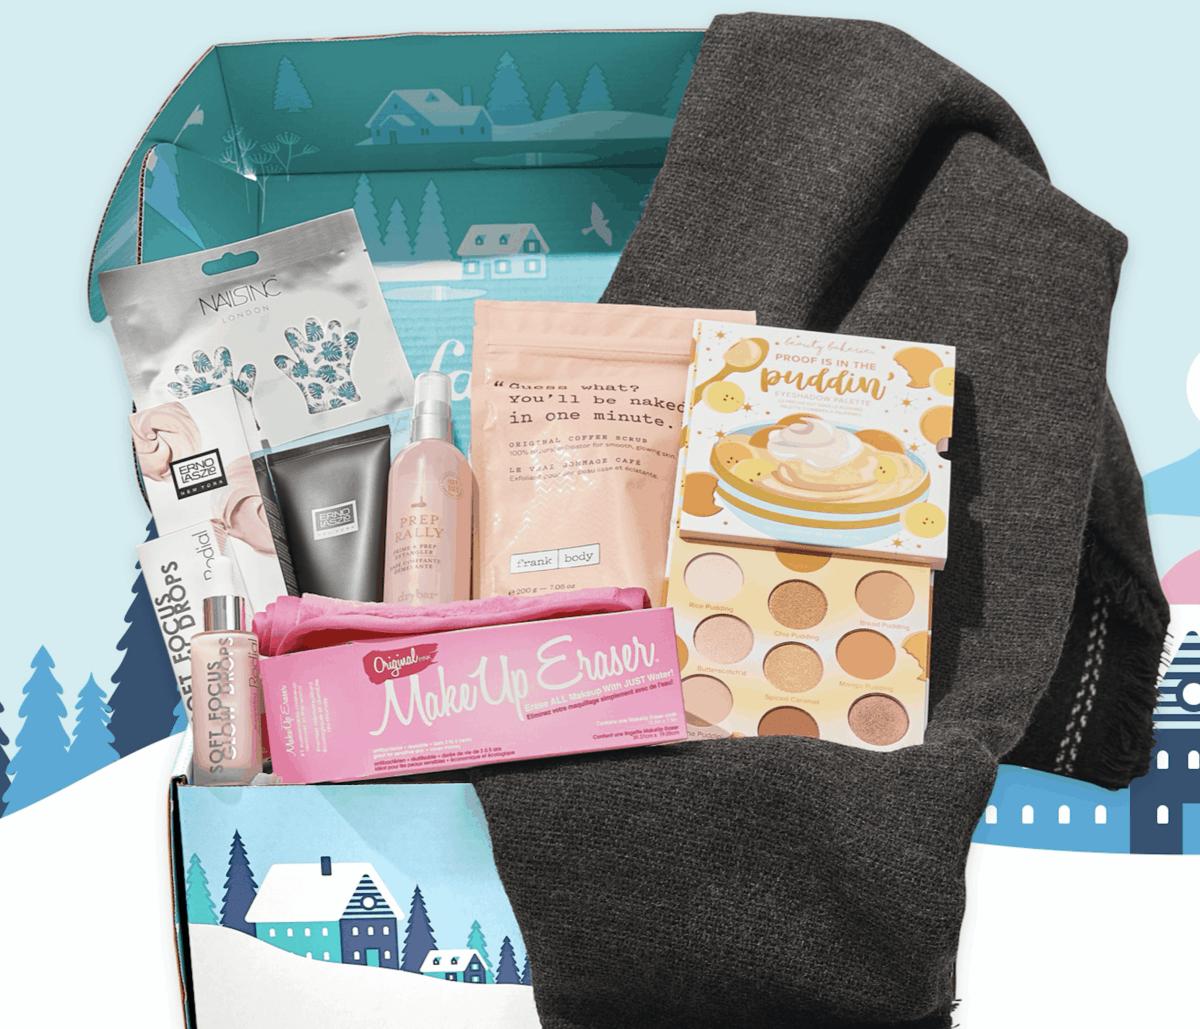 FabFitFun 2019 Winter Editors Box #2 – On Sale Now + FULL Spoilers + $10 Coupon Code